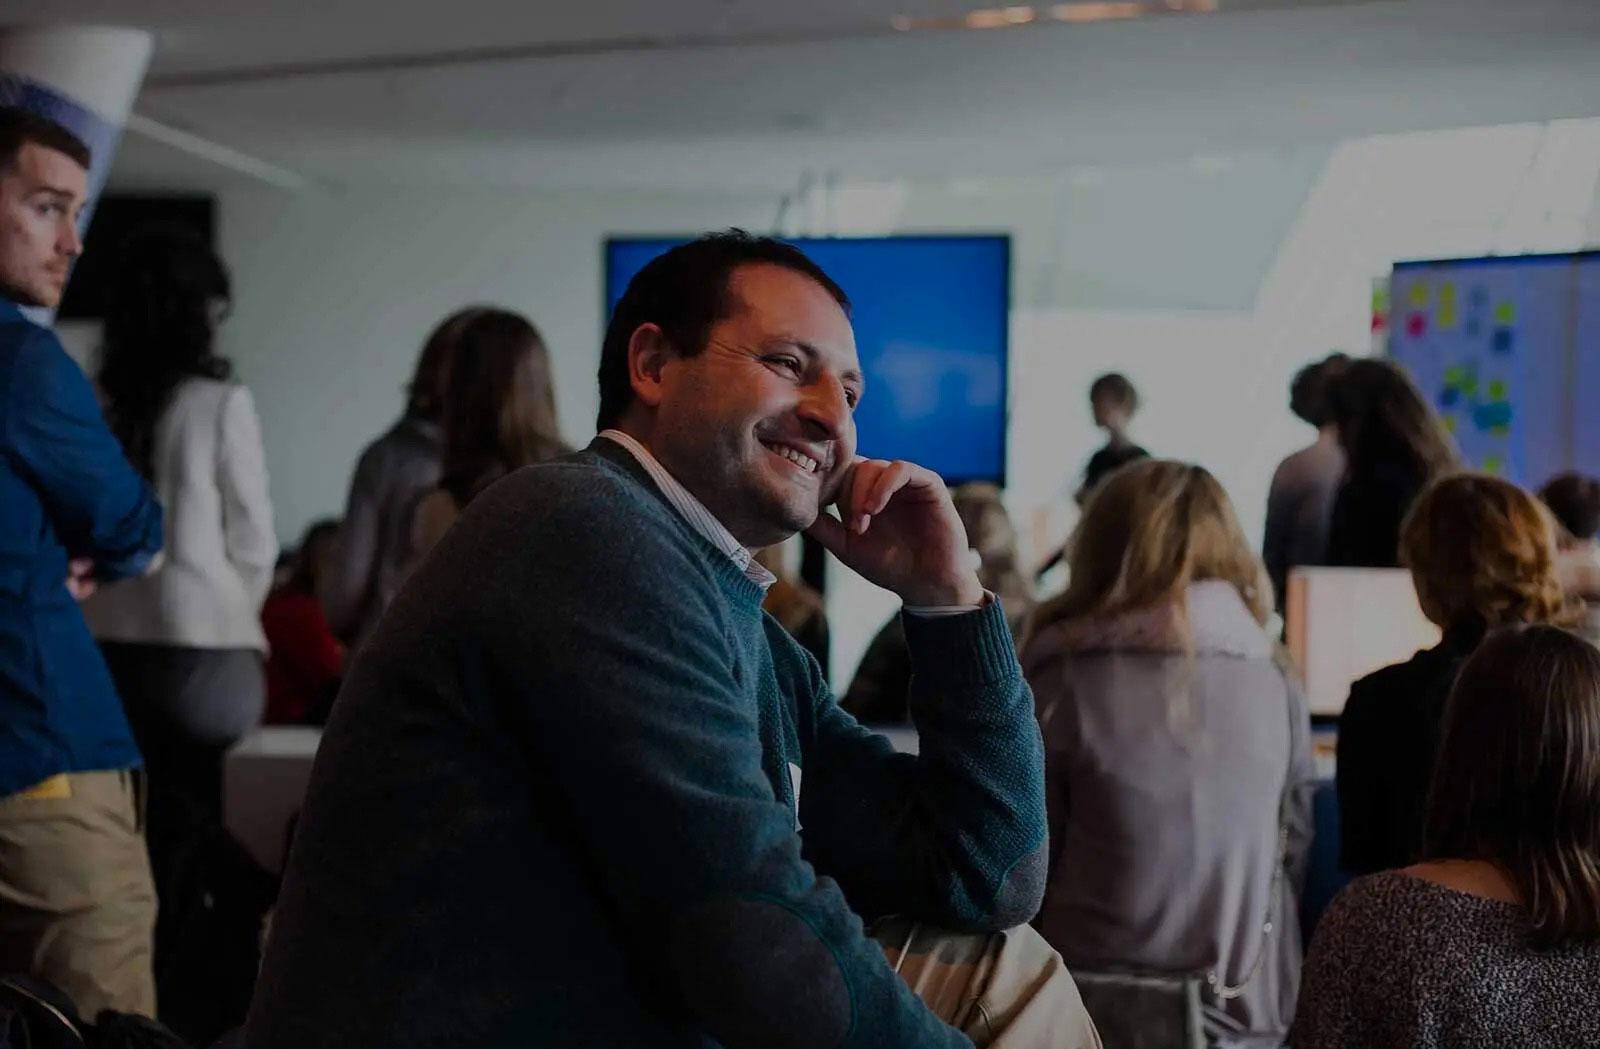 Interview with IBM's Service & Interaction Design Lead Diego Dalia